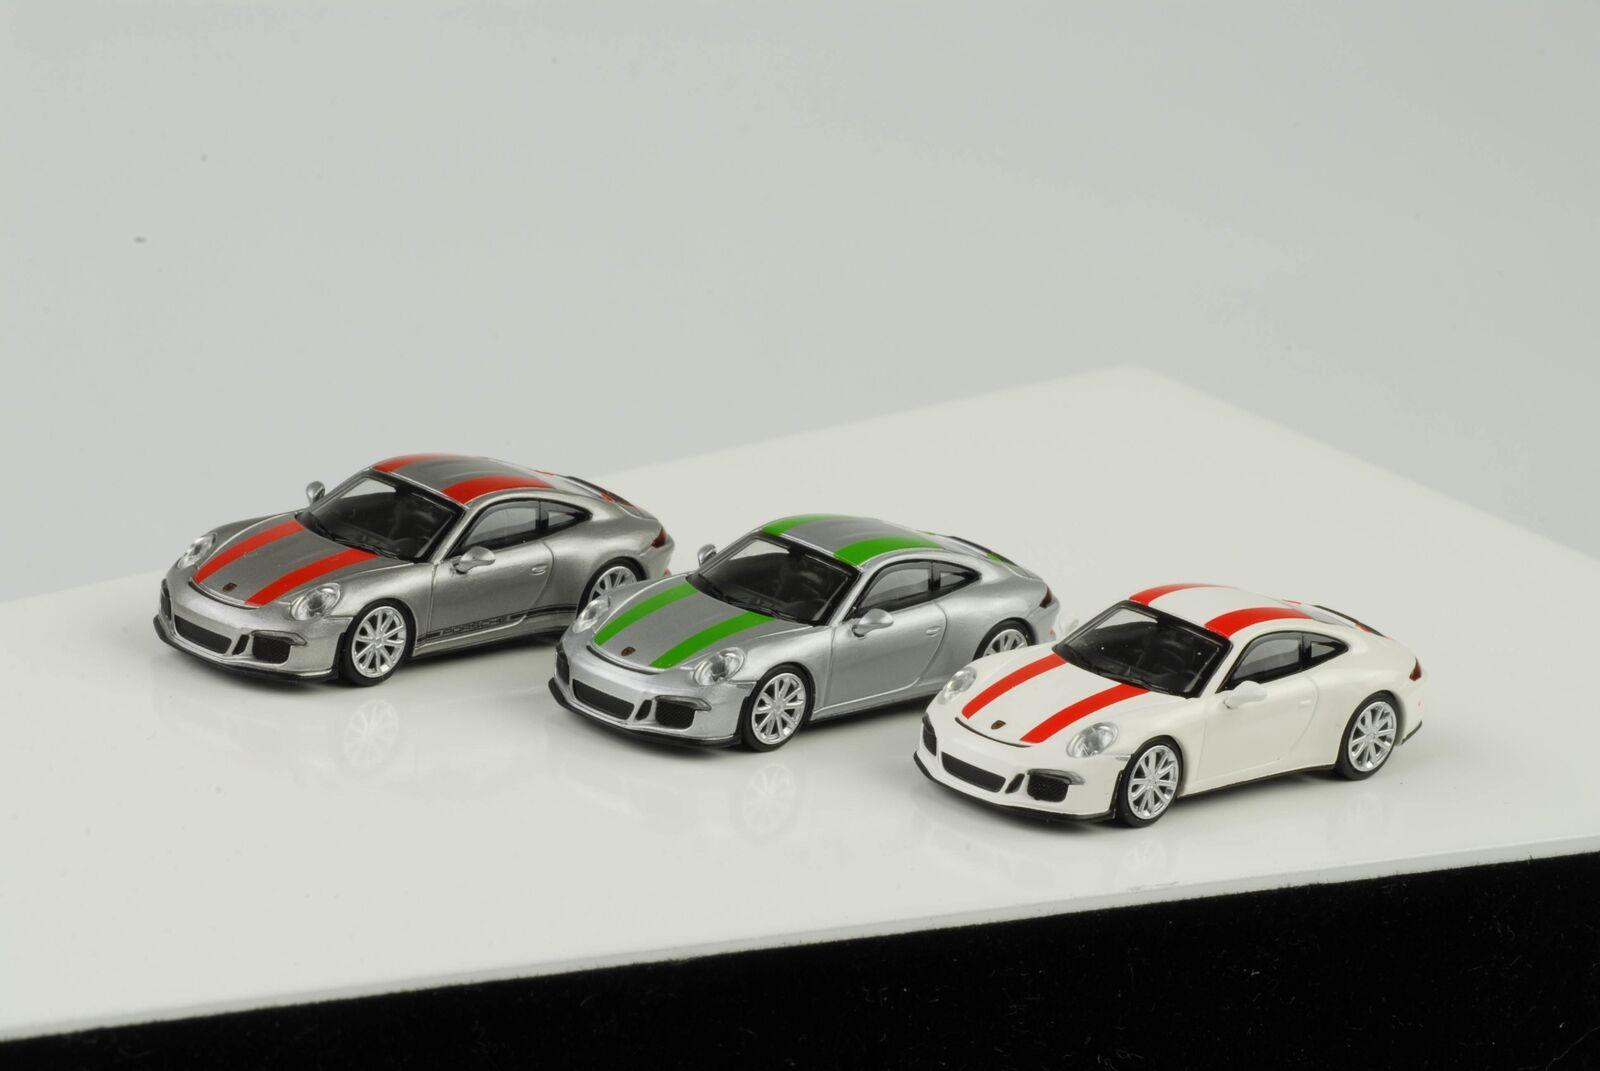 3 x 2016 Porsche 911 R 911R Bianco argentoo verde Rosso Strisce 1 87 Minichamps